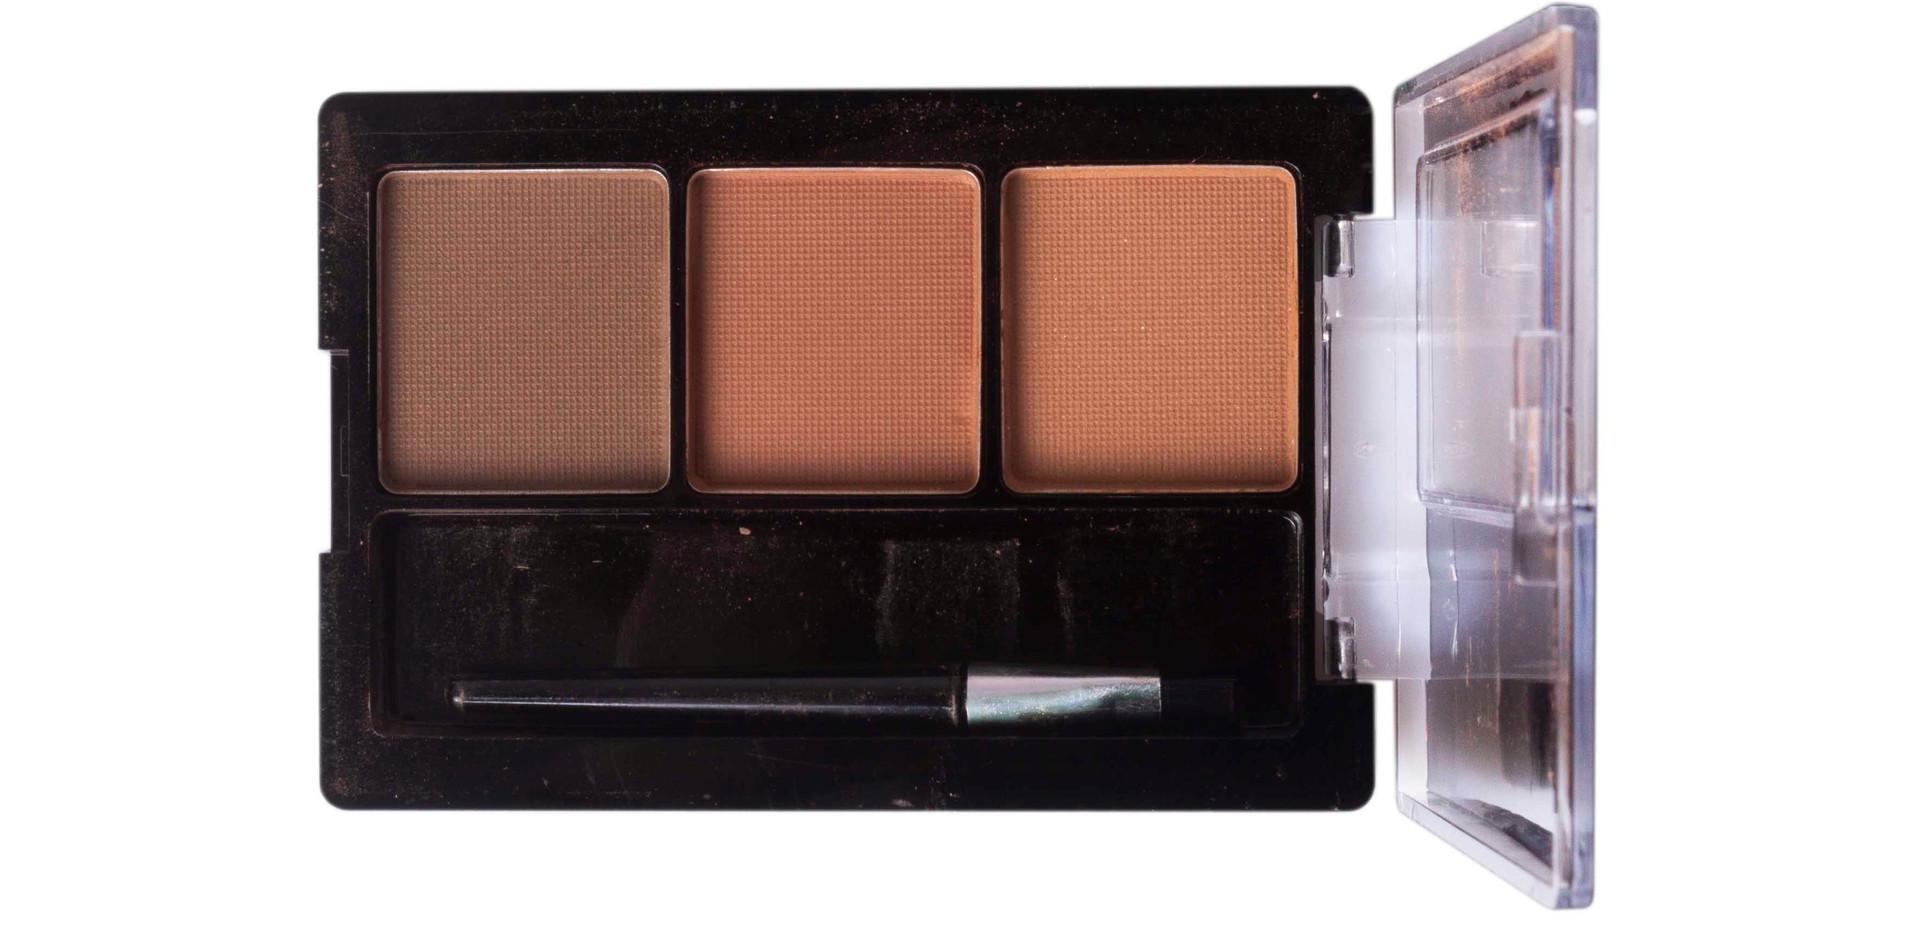 Paleta de Sombras para Sobrancelha Dapop - HB96642 (2)